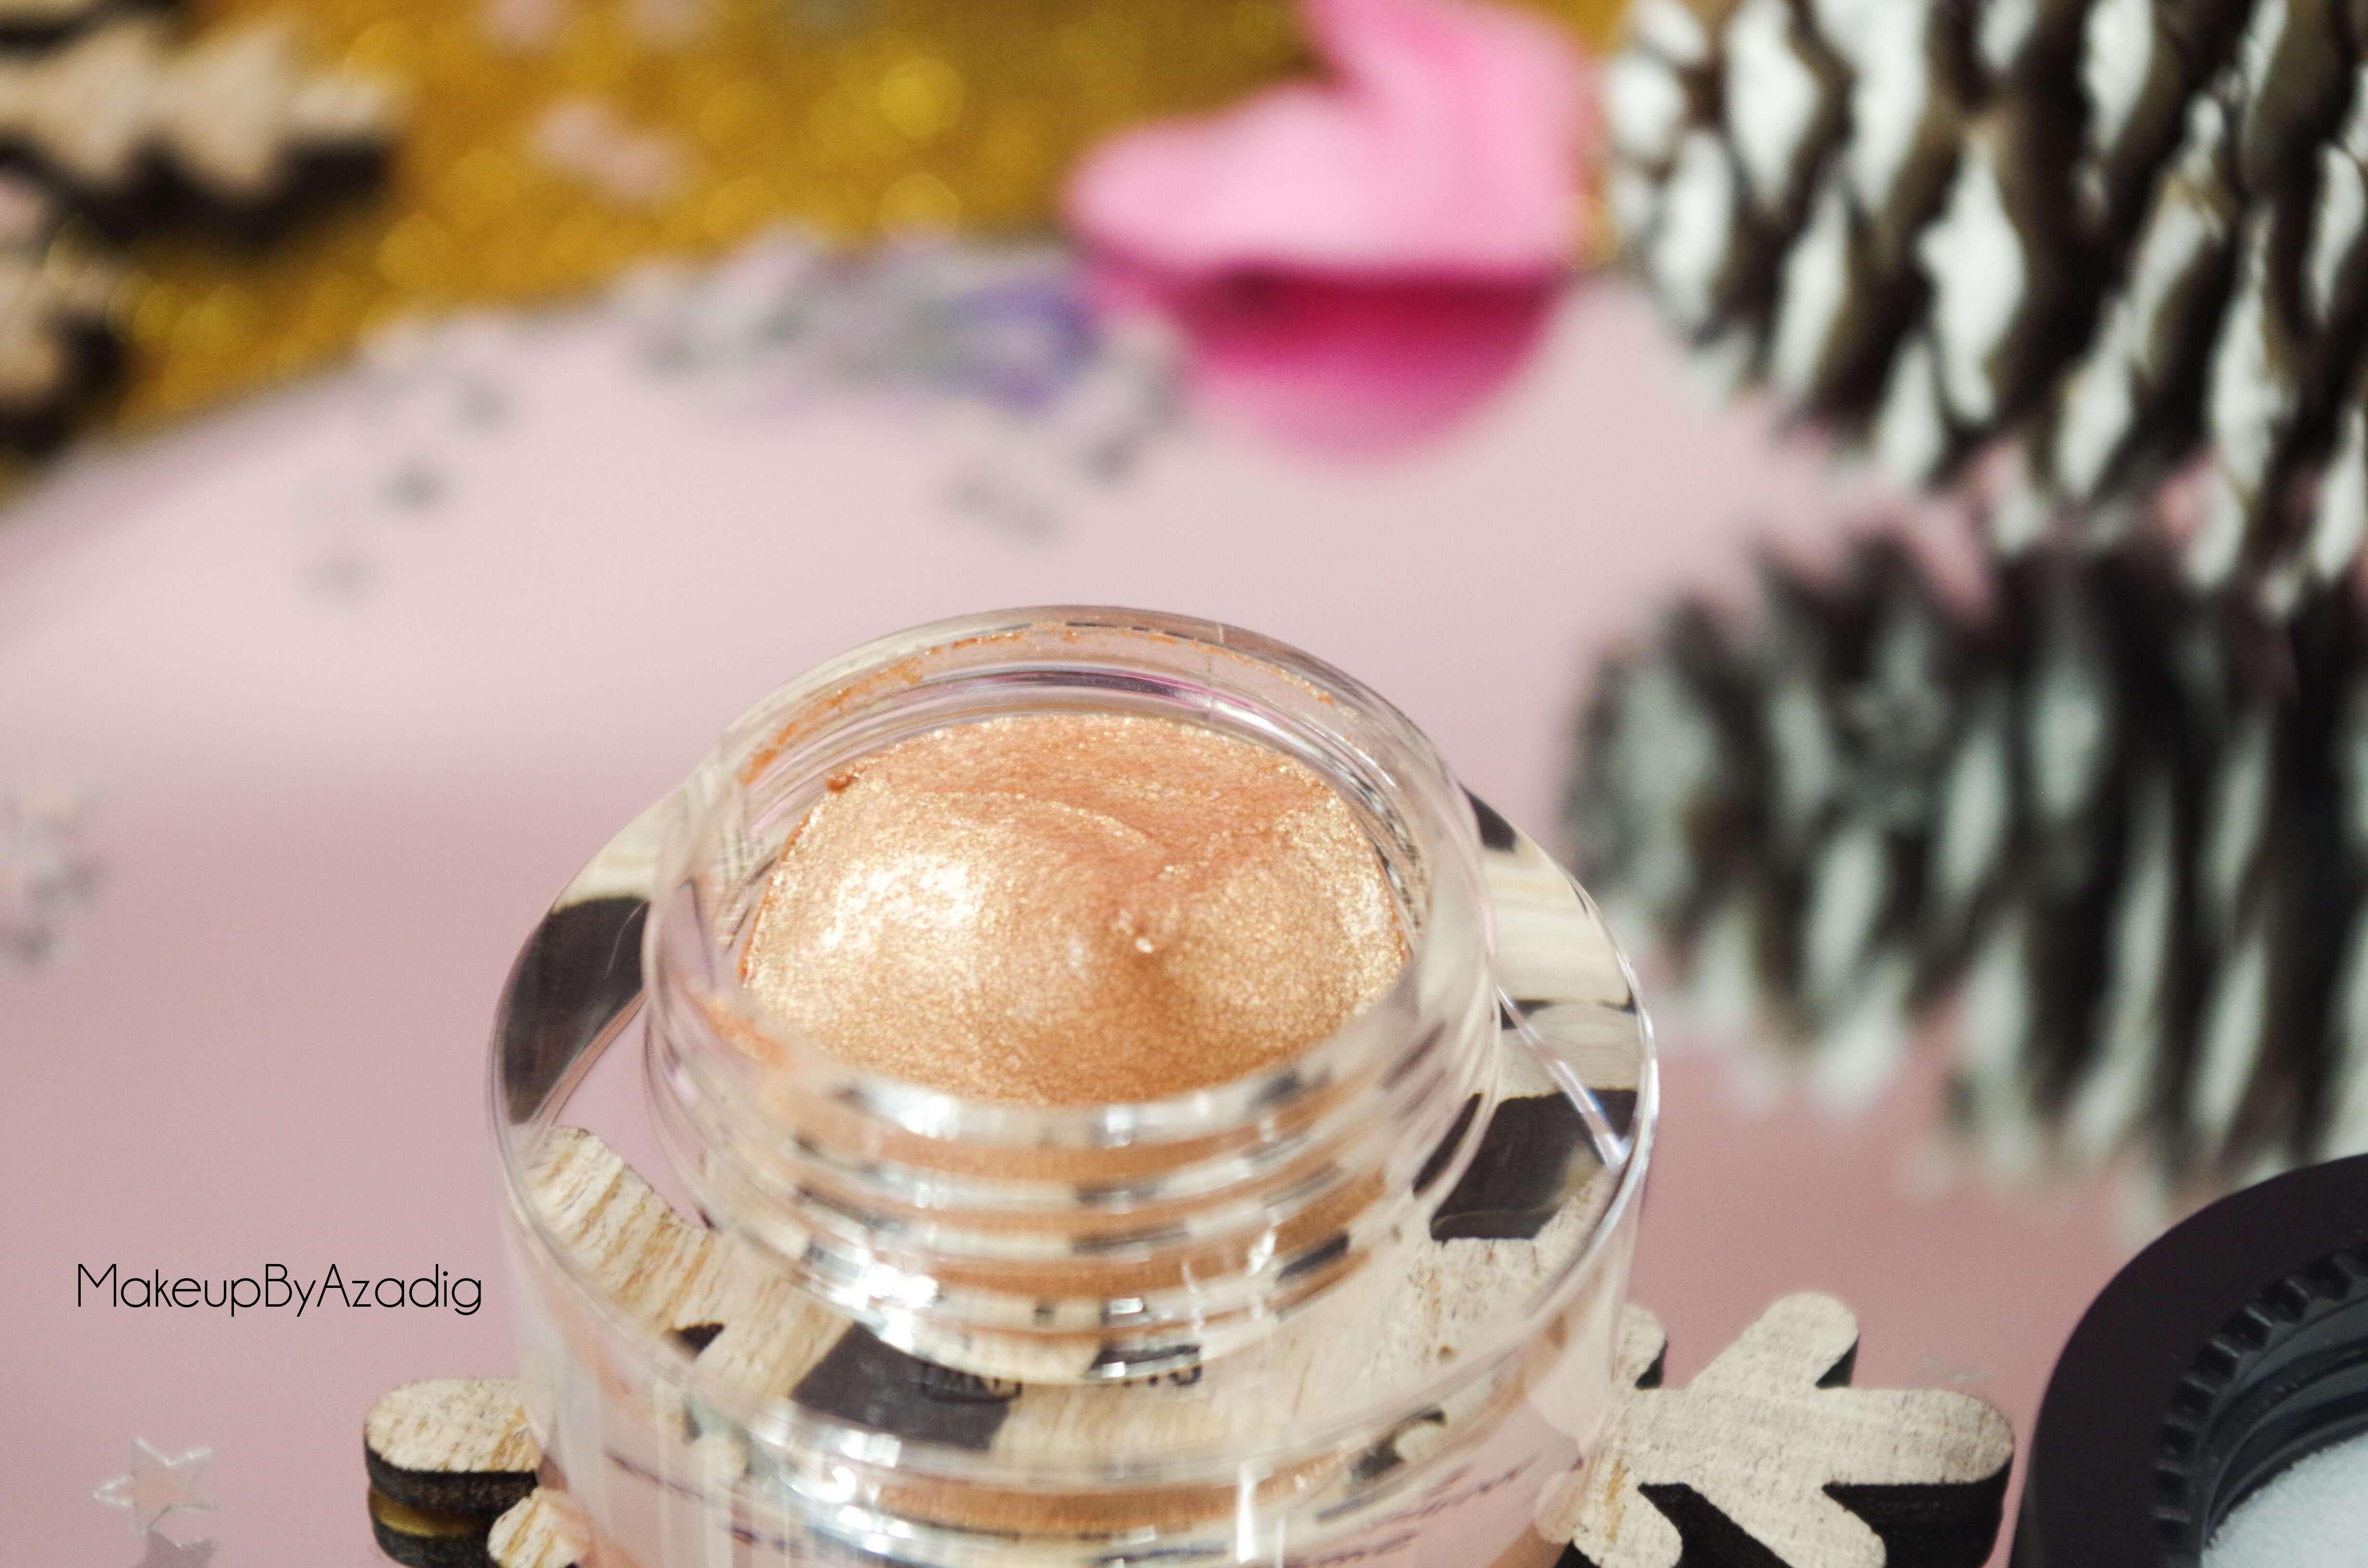 highlighter-sleek-makeup-strobing-souffle-smoky-quartz-sephora-swatch-makeupbyazadig-avis-paris